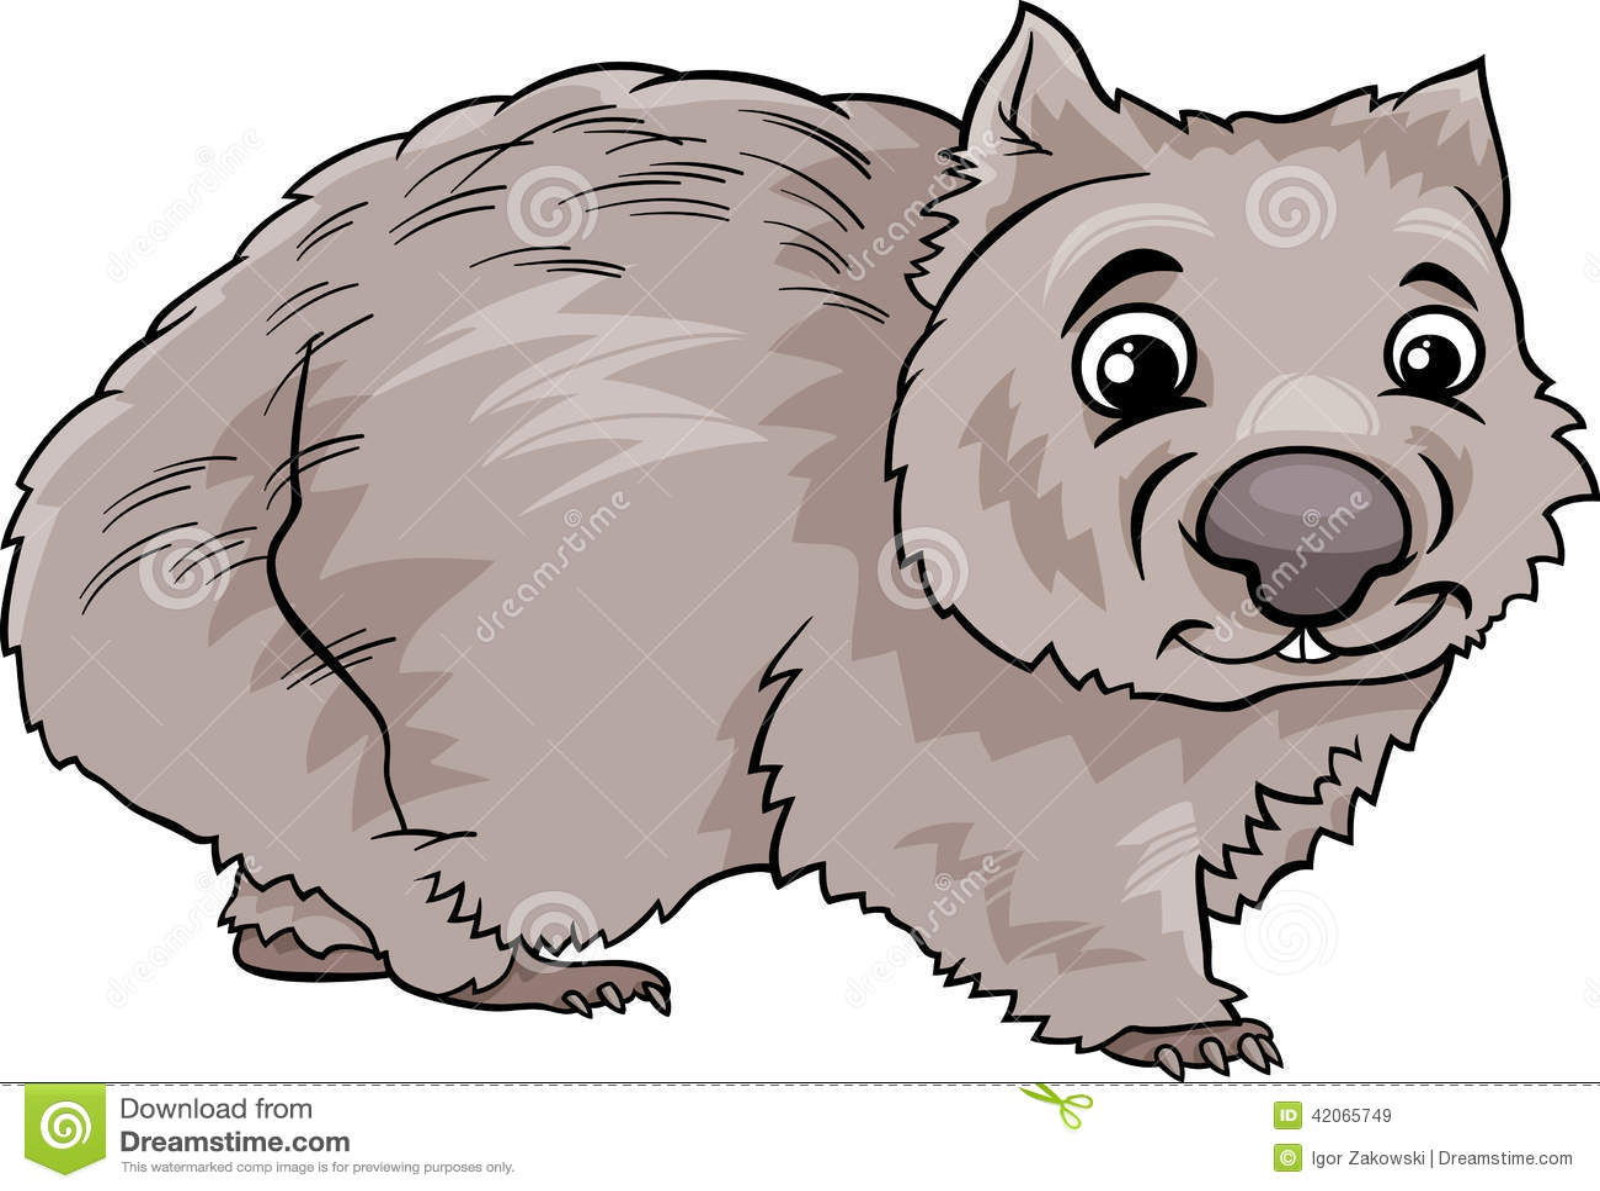 wombat animal cartoon illustration stock vector   image 42065749